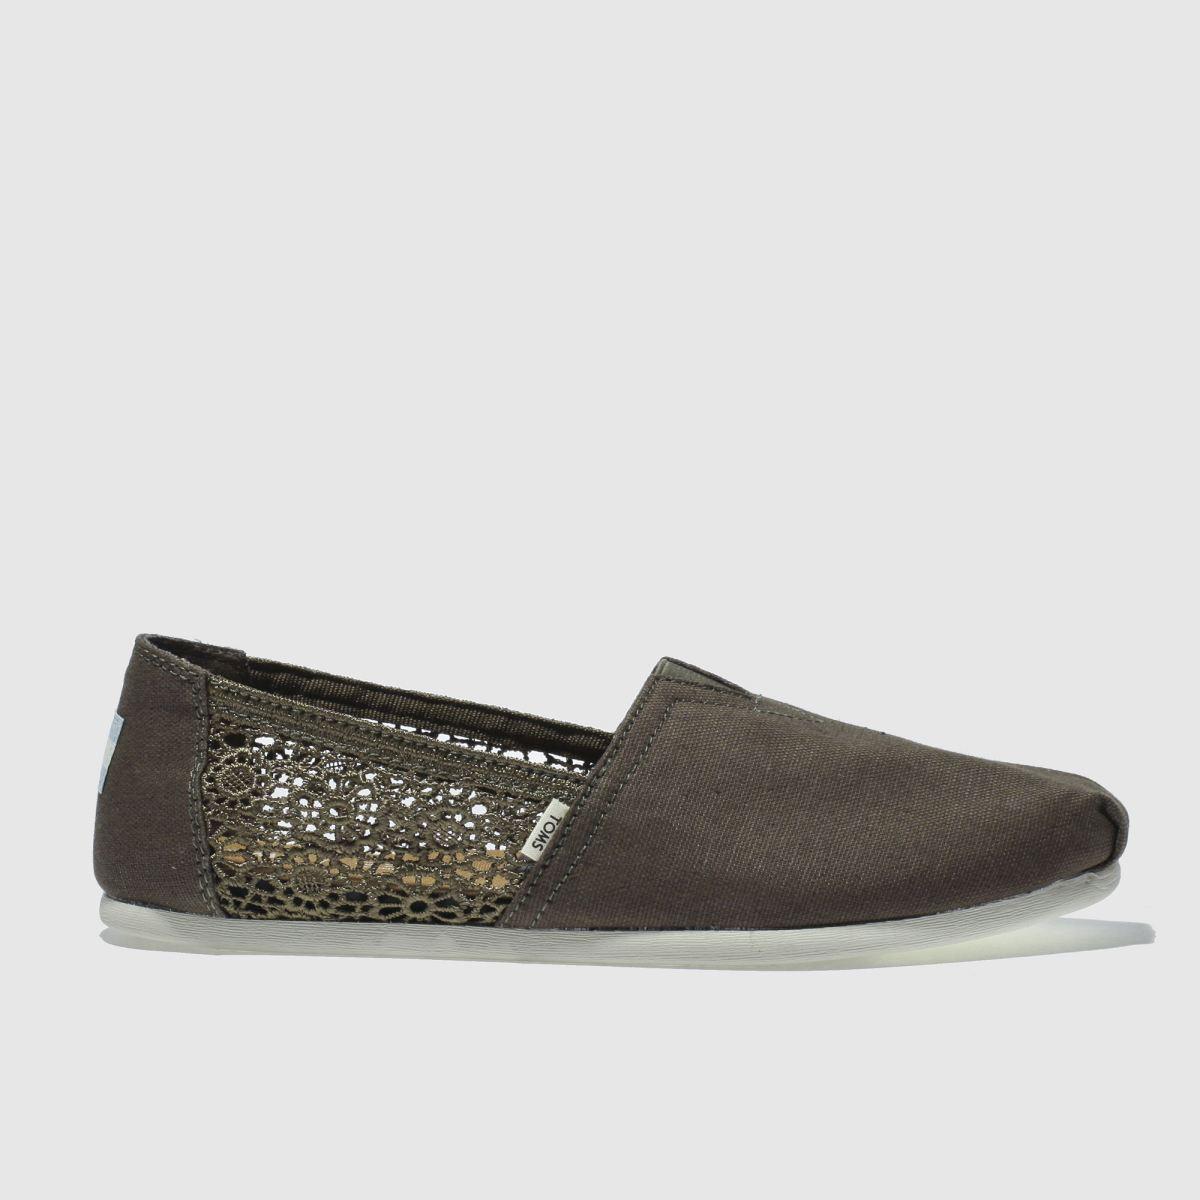 Toms Khaki Classic Hemp Crochet Flat Shoes